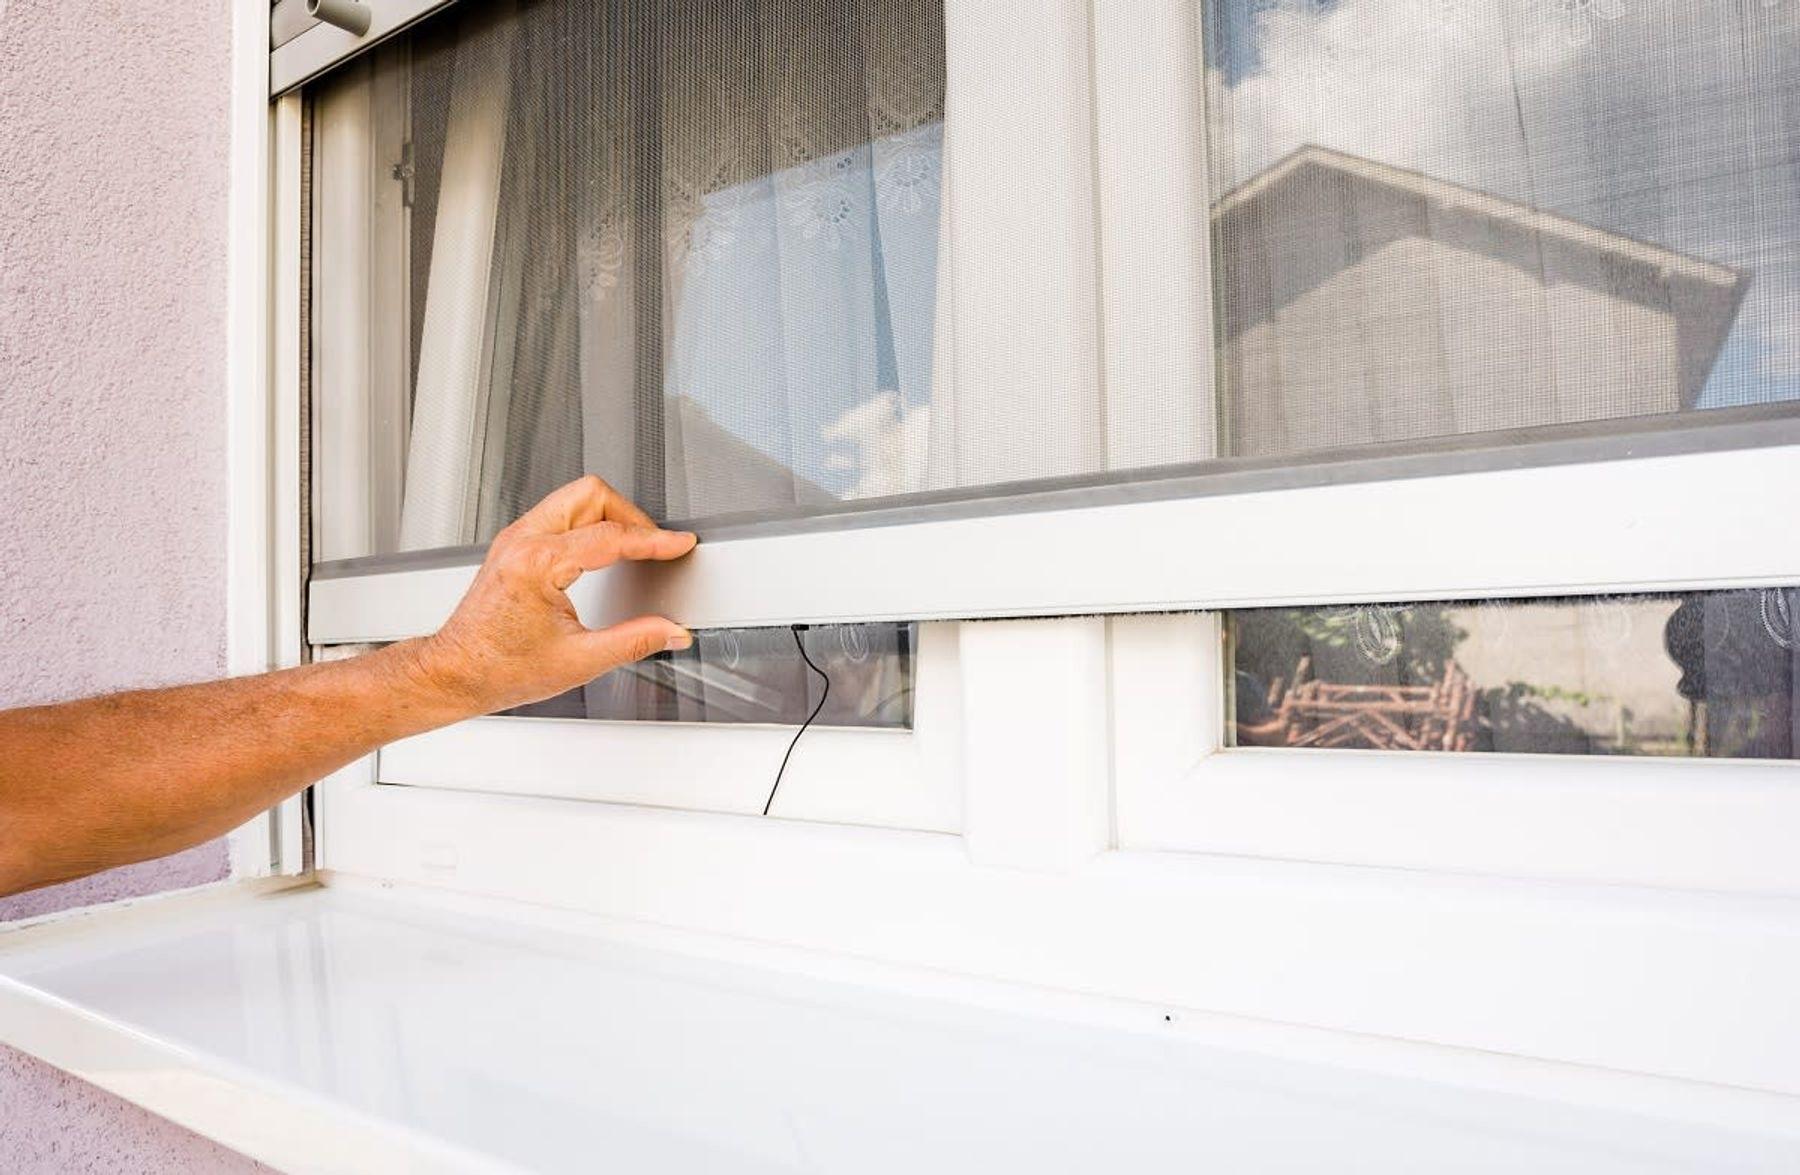 Step 3: PVC Pencere ve Sineklik